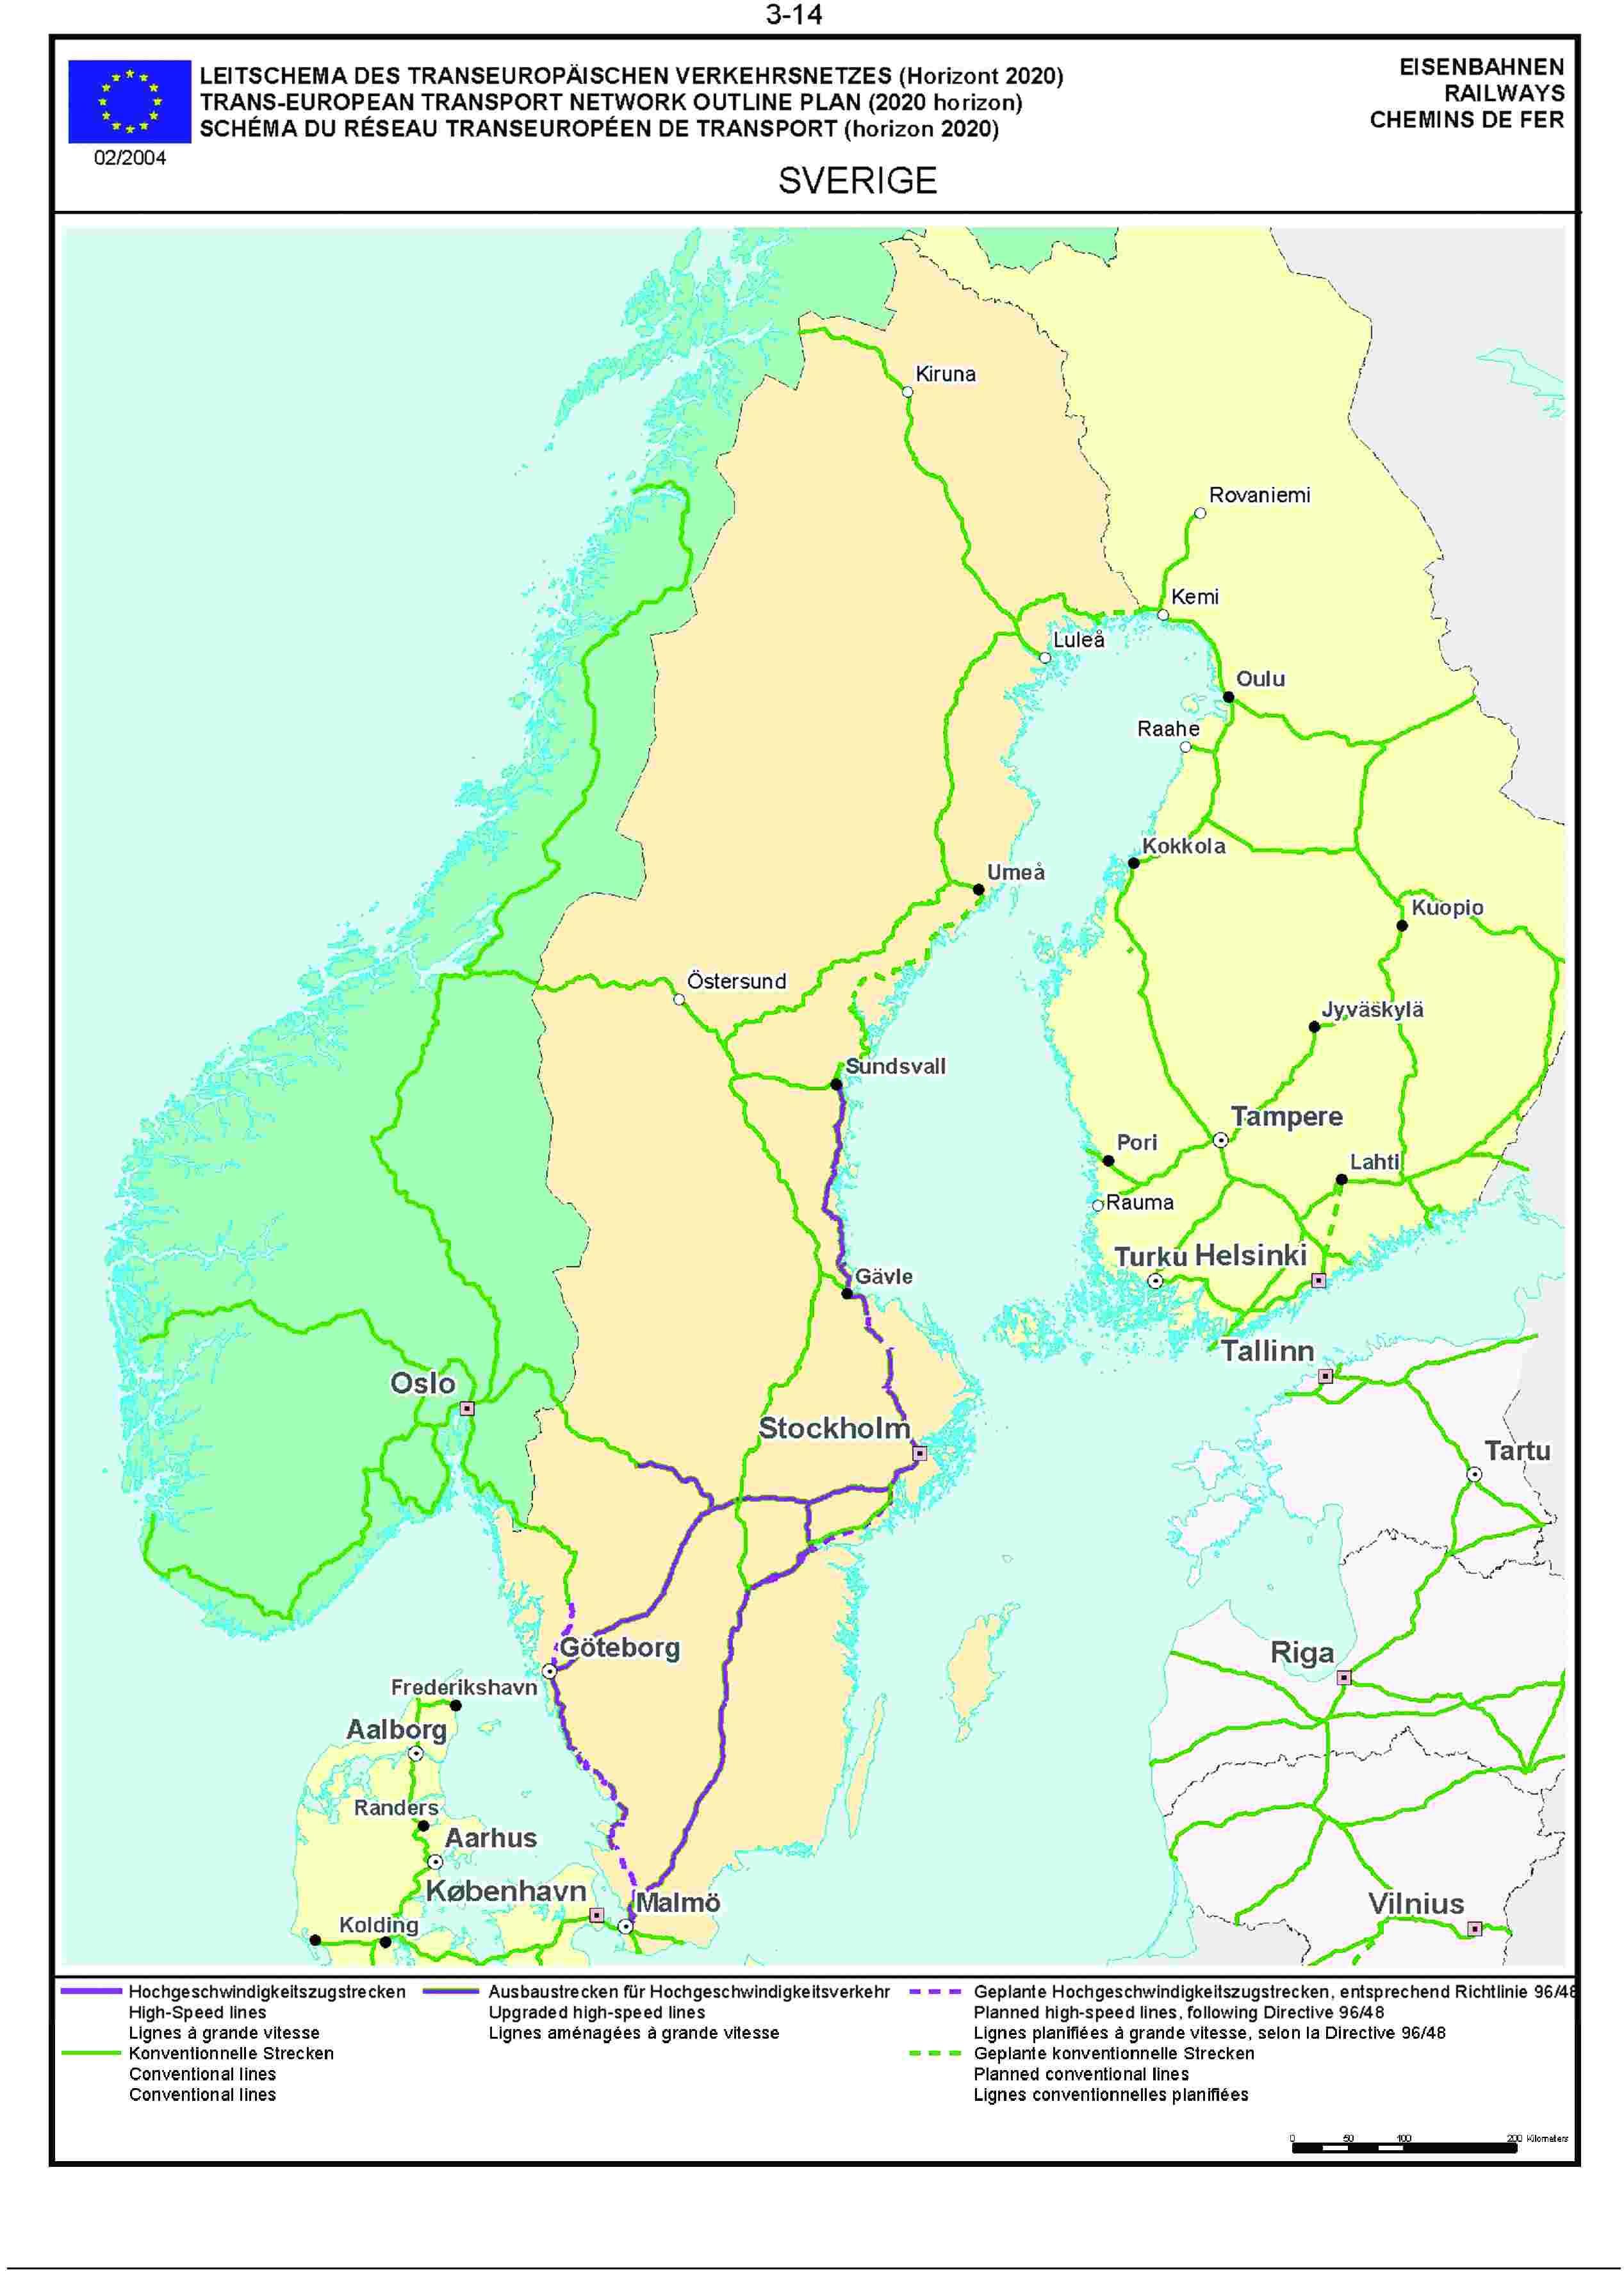 3.14LEITSCHEMA DES TRANSEUROPÄISCHEN VERKEHRSNETZES (Horizont 2020) EISENBAHNENTRANS-EUROPEAN TRANSPORT NETWORK OUTLINE PLAN (2020 horizon) RAILWAYSSCHÉMA DU RÉSEAU TRANSEUROPÉEN DE TRANSPORT (horizon 2020) CHEMINS DE FER02/2004SVERIGE